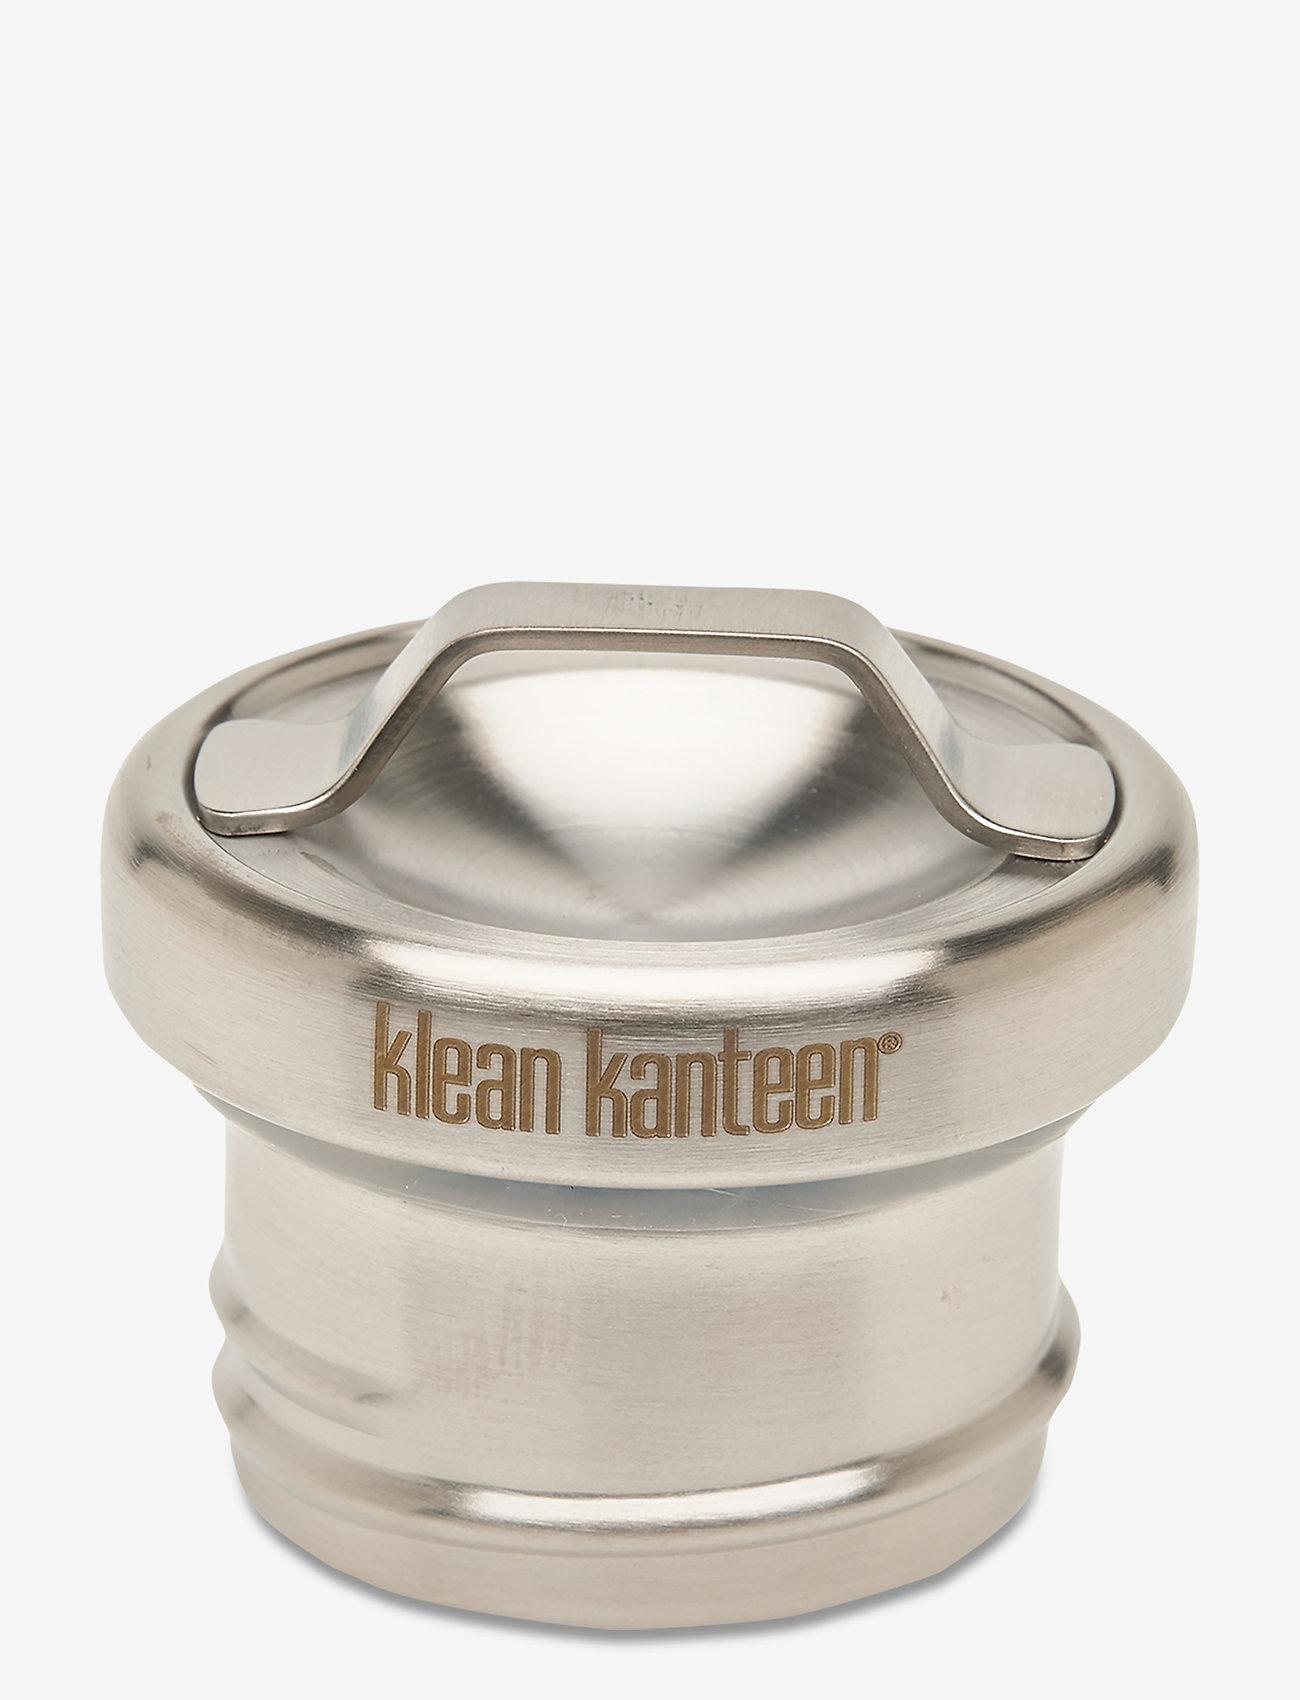 Klean Kanteen - Klean Kanteen Steel Loop Cap Brushed Stainless - brushed stainless - 0